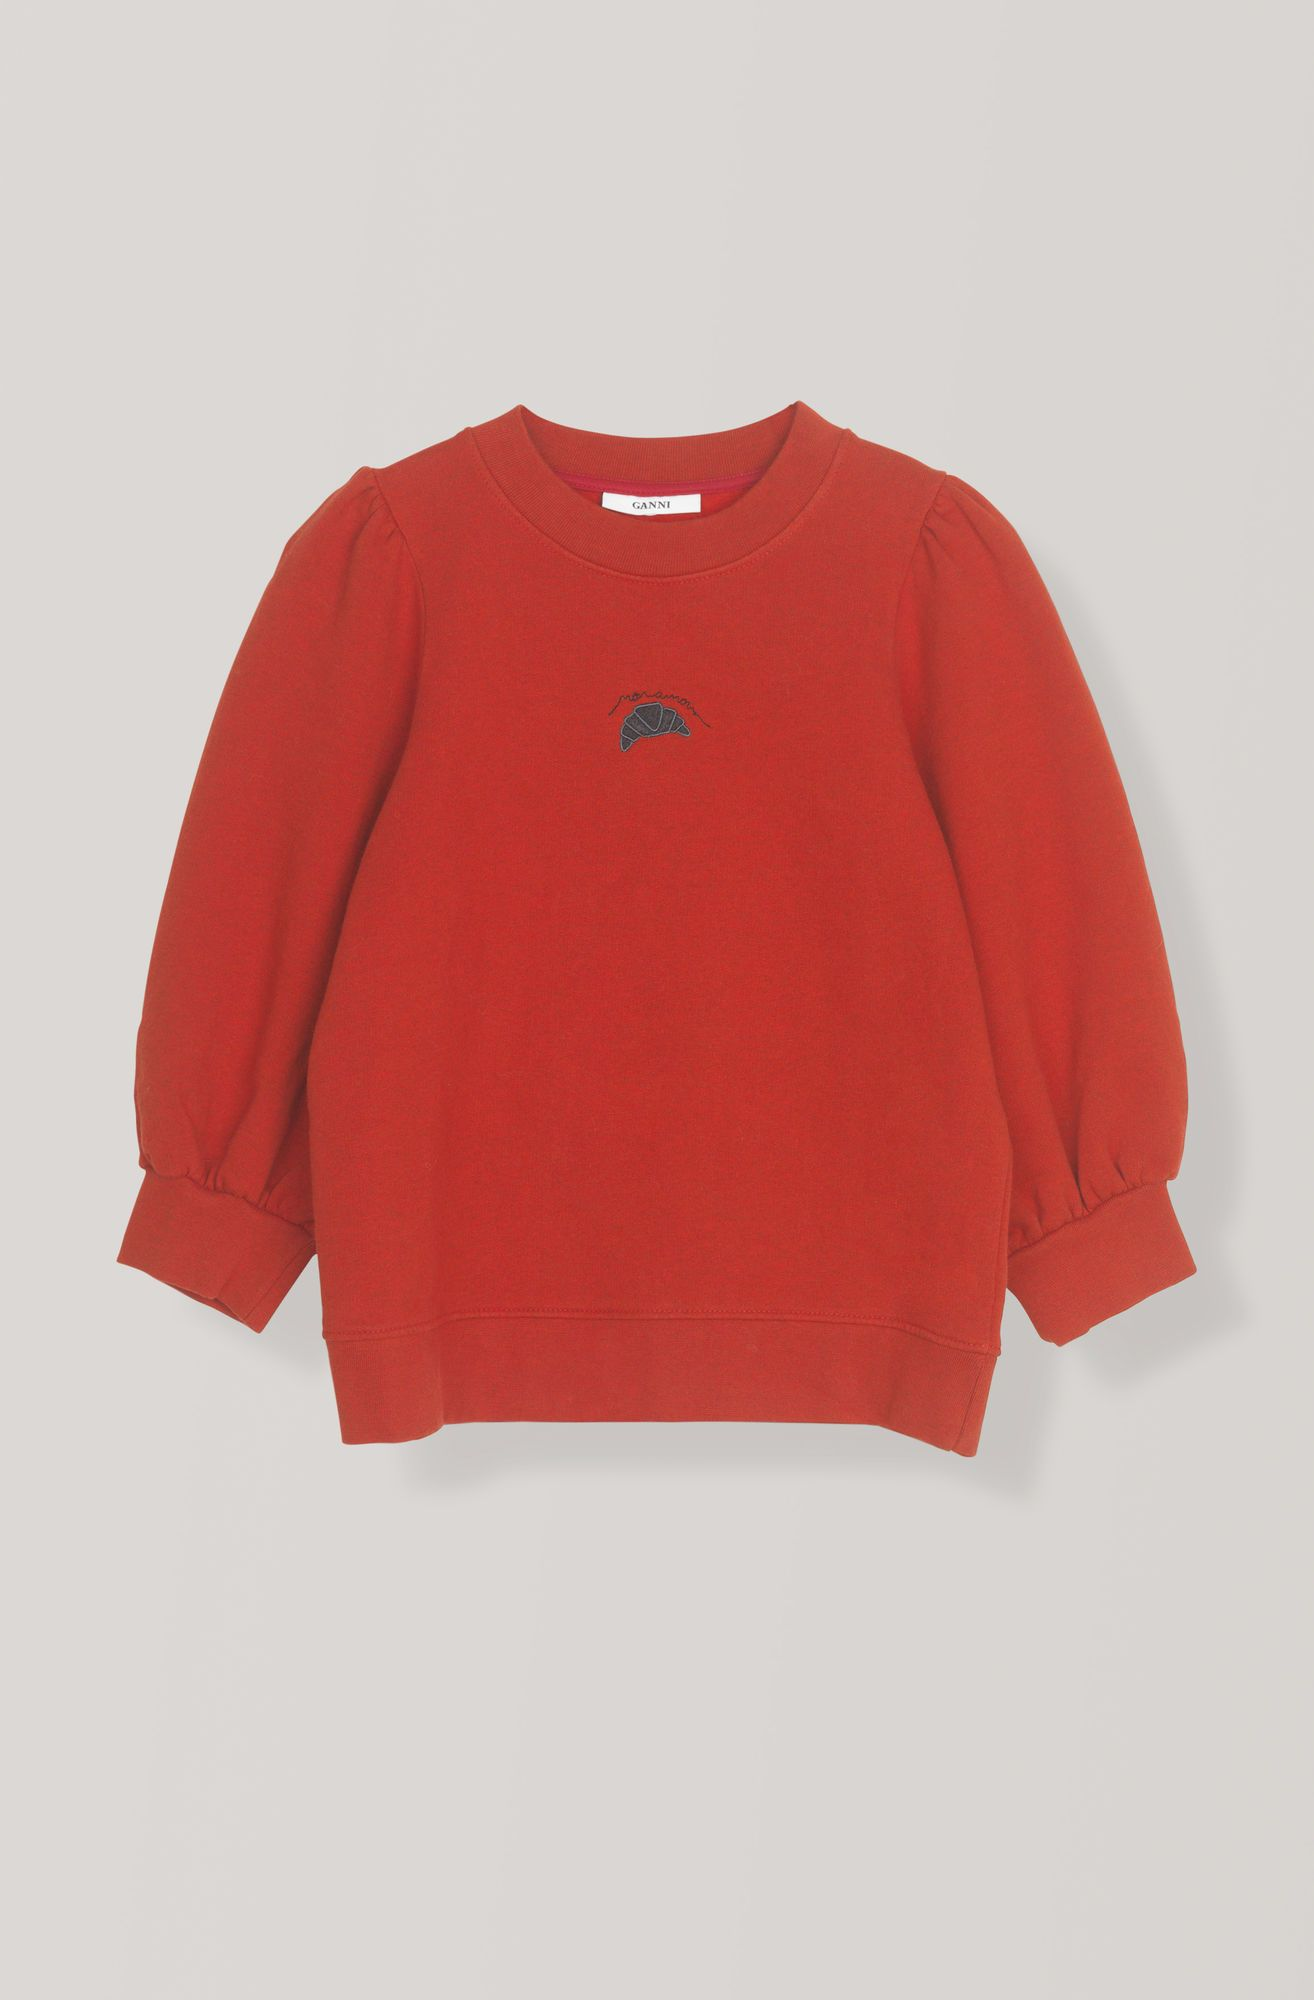 3eb591a8a Lott Isoli Sweatshirt, Mon Amour, Fiery Red   GANNI   Bluebell i 2019